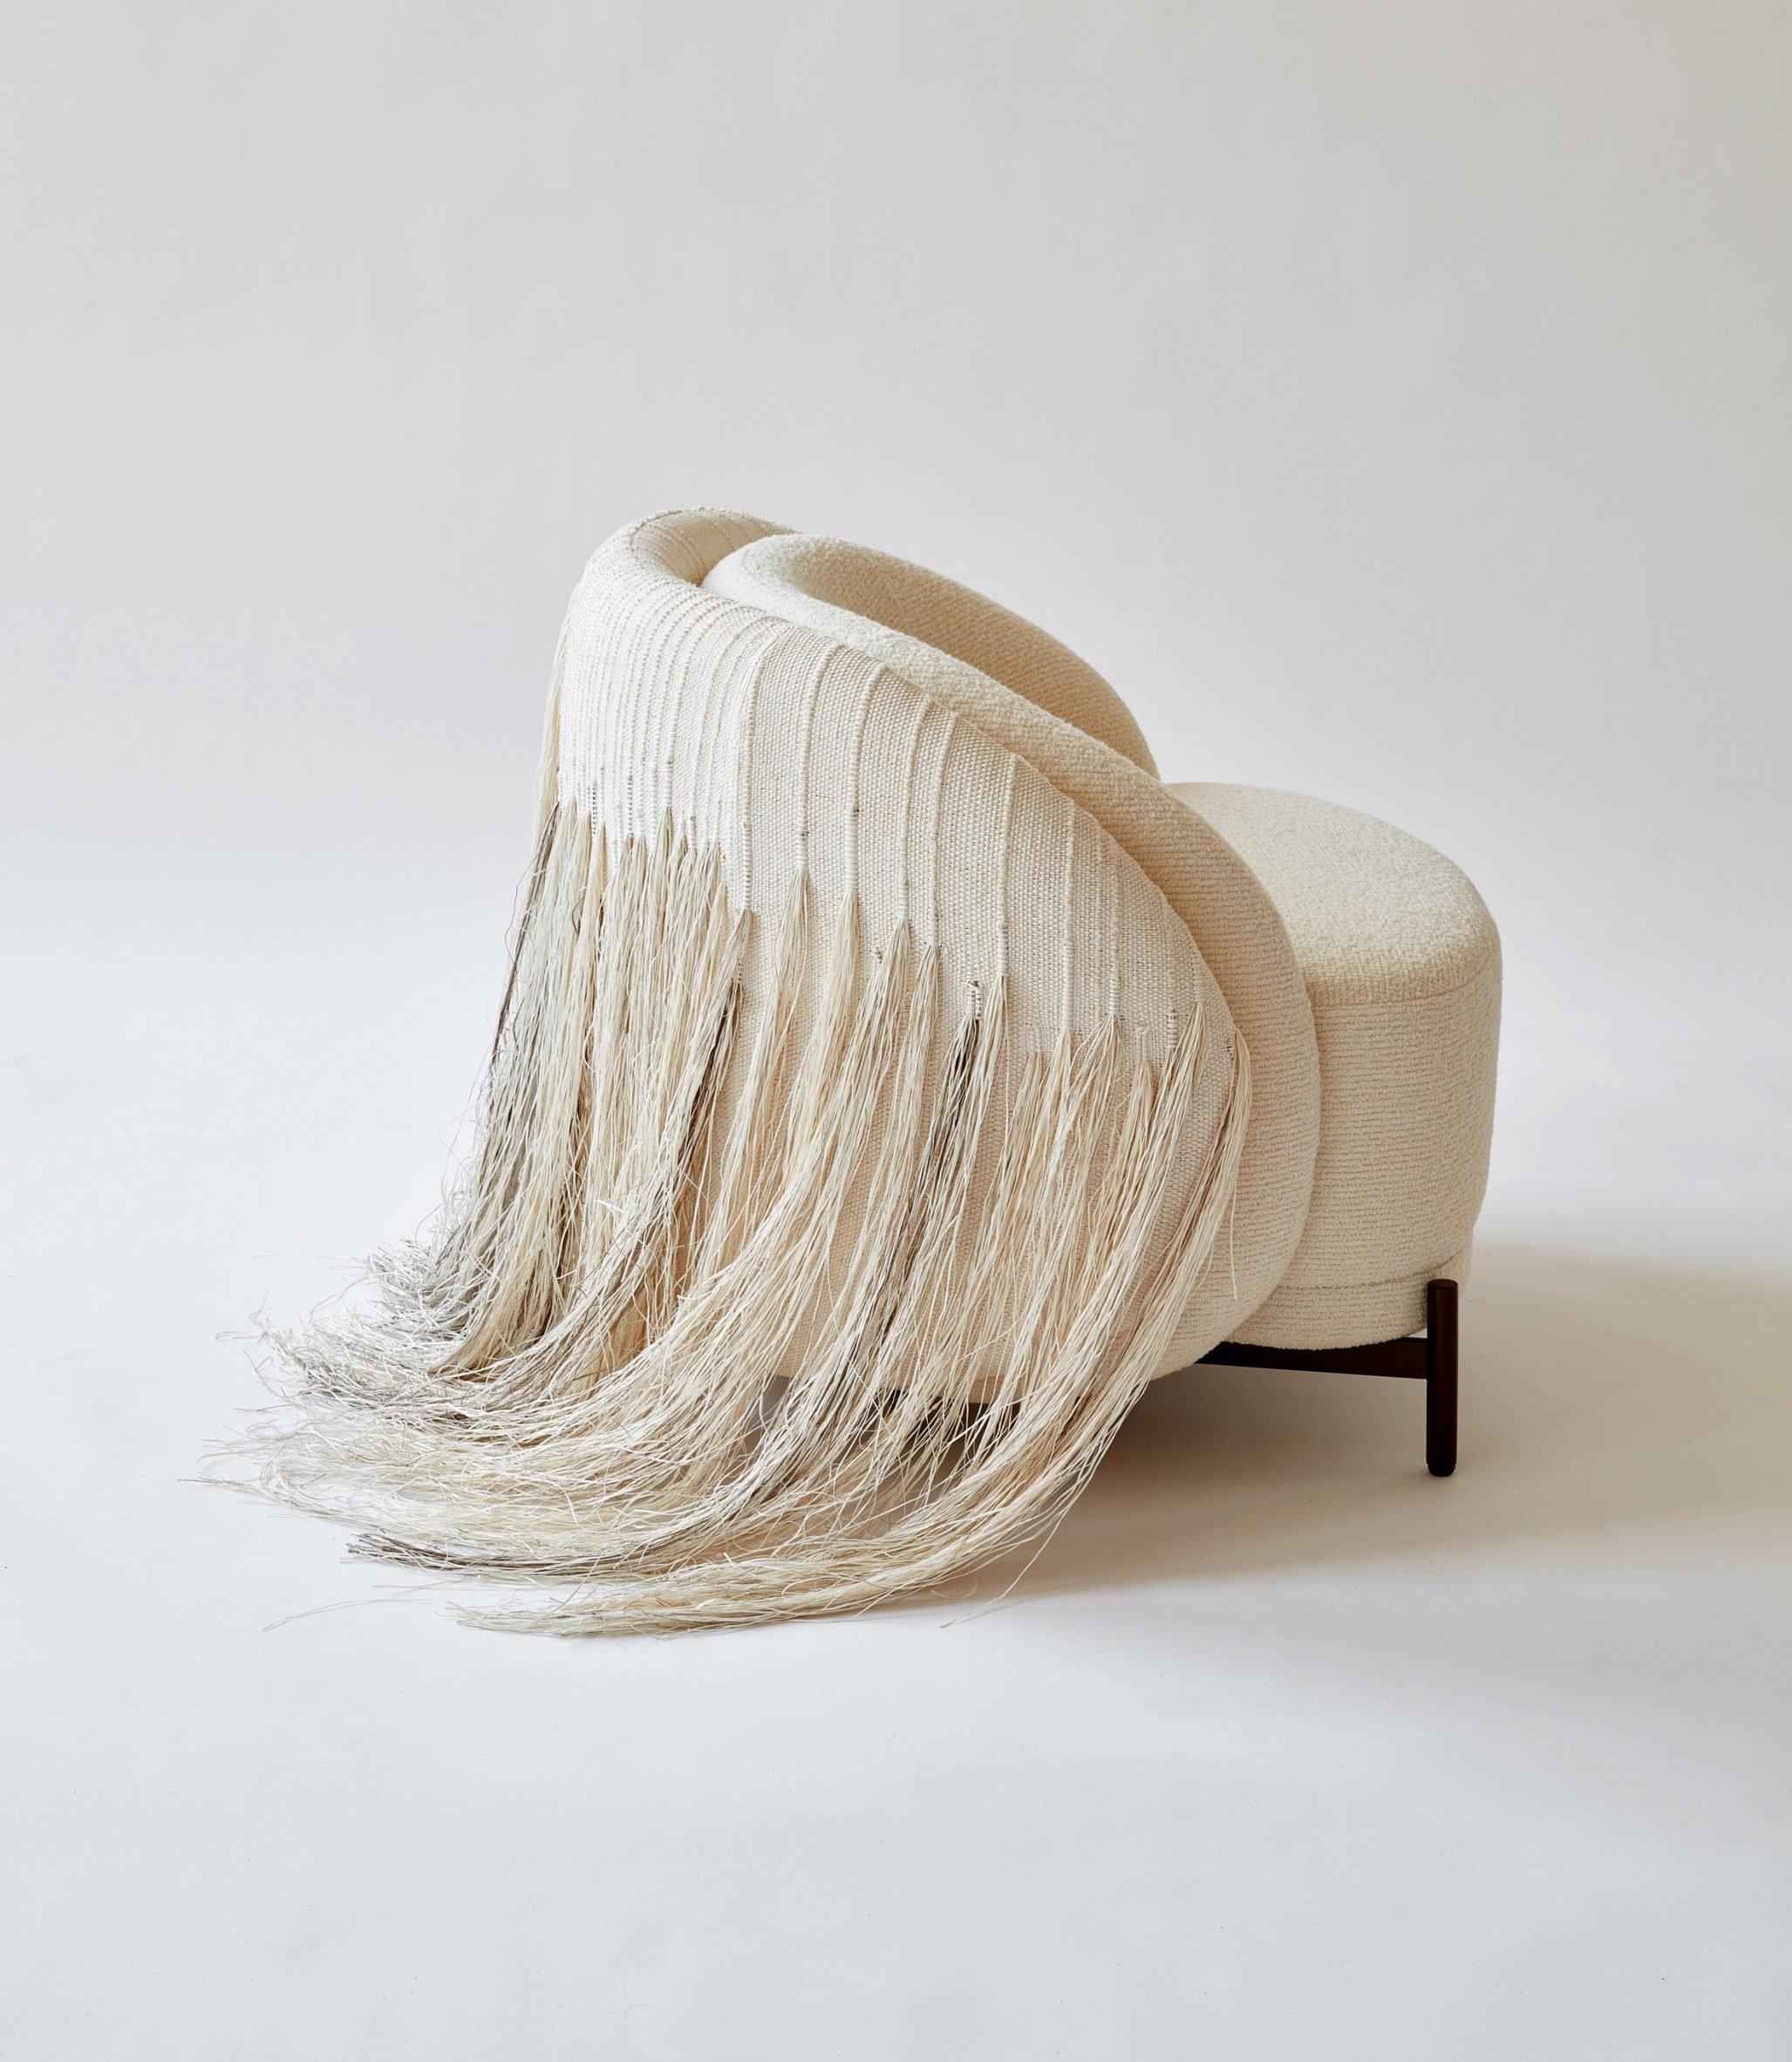 AME Natural Lounge chair by Paolo Ferrari via Twentieth Gallery